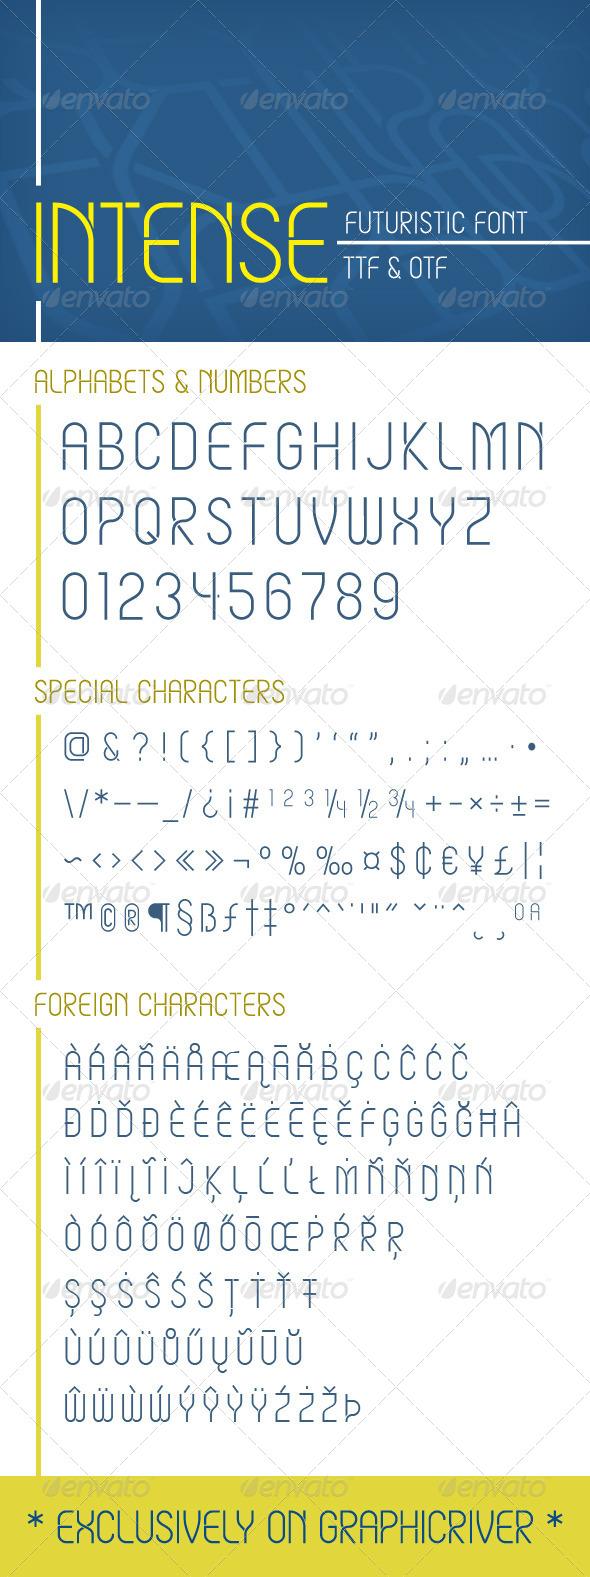 GraphicRiver Intense Font 6641639